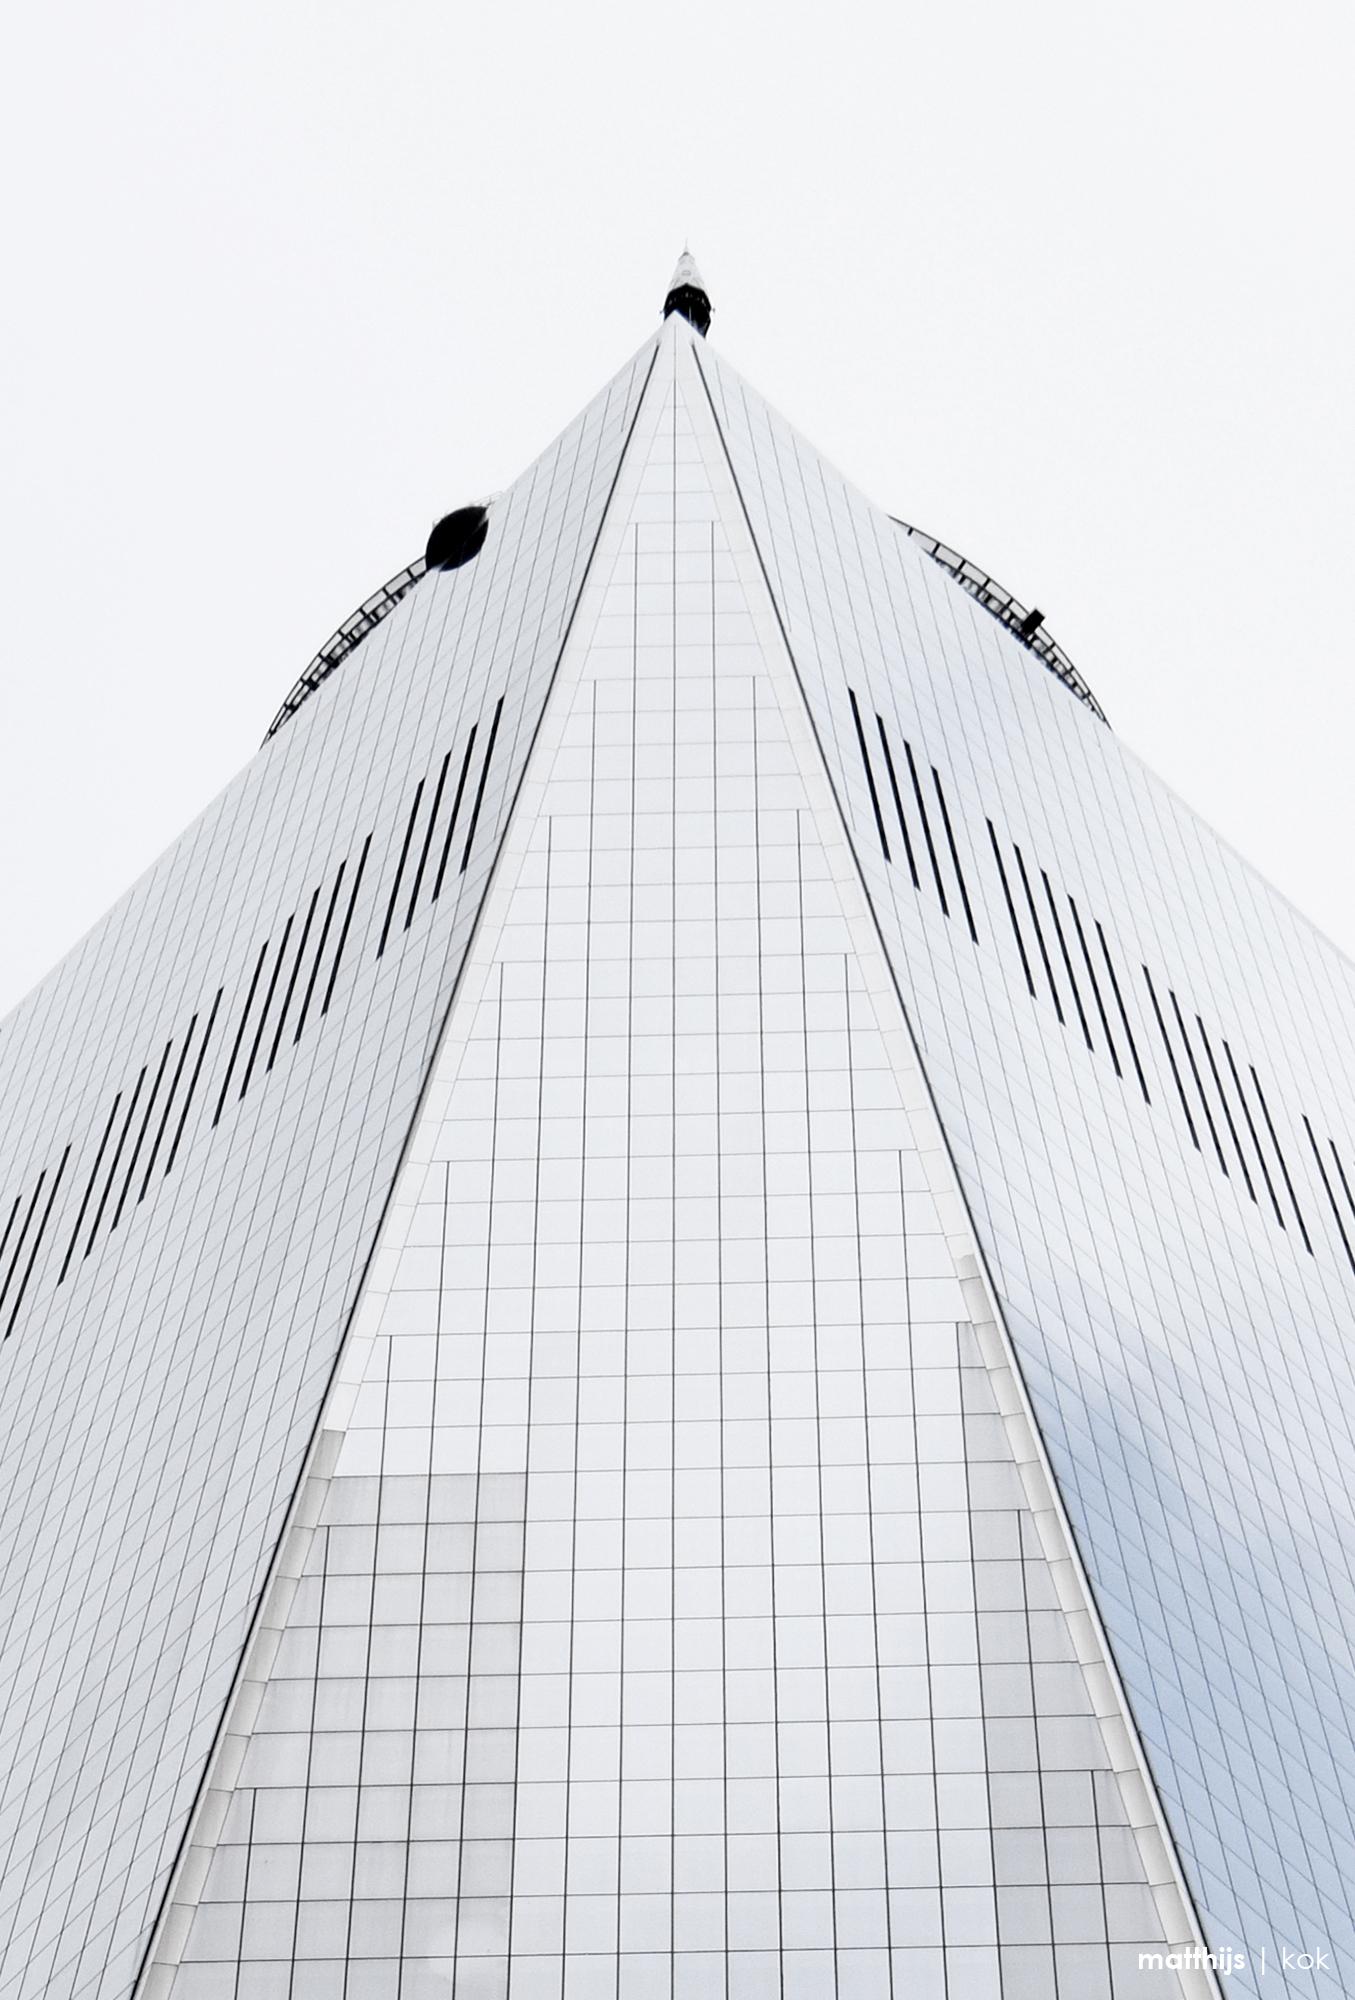 One World Trade Center, New York | Photo by Matthijs Kok